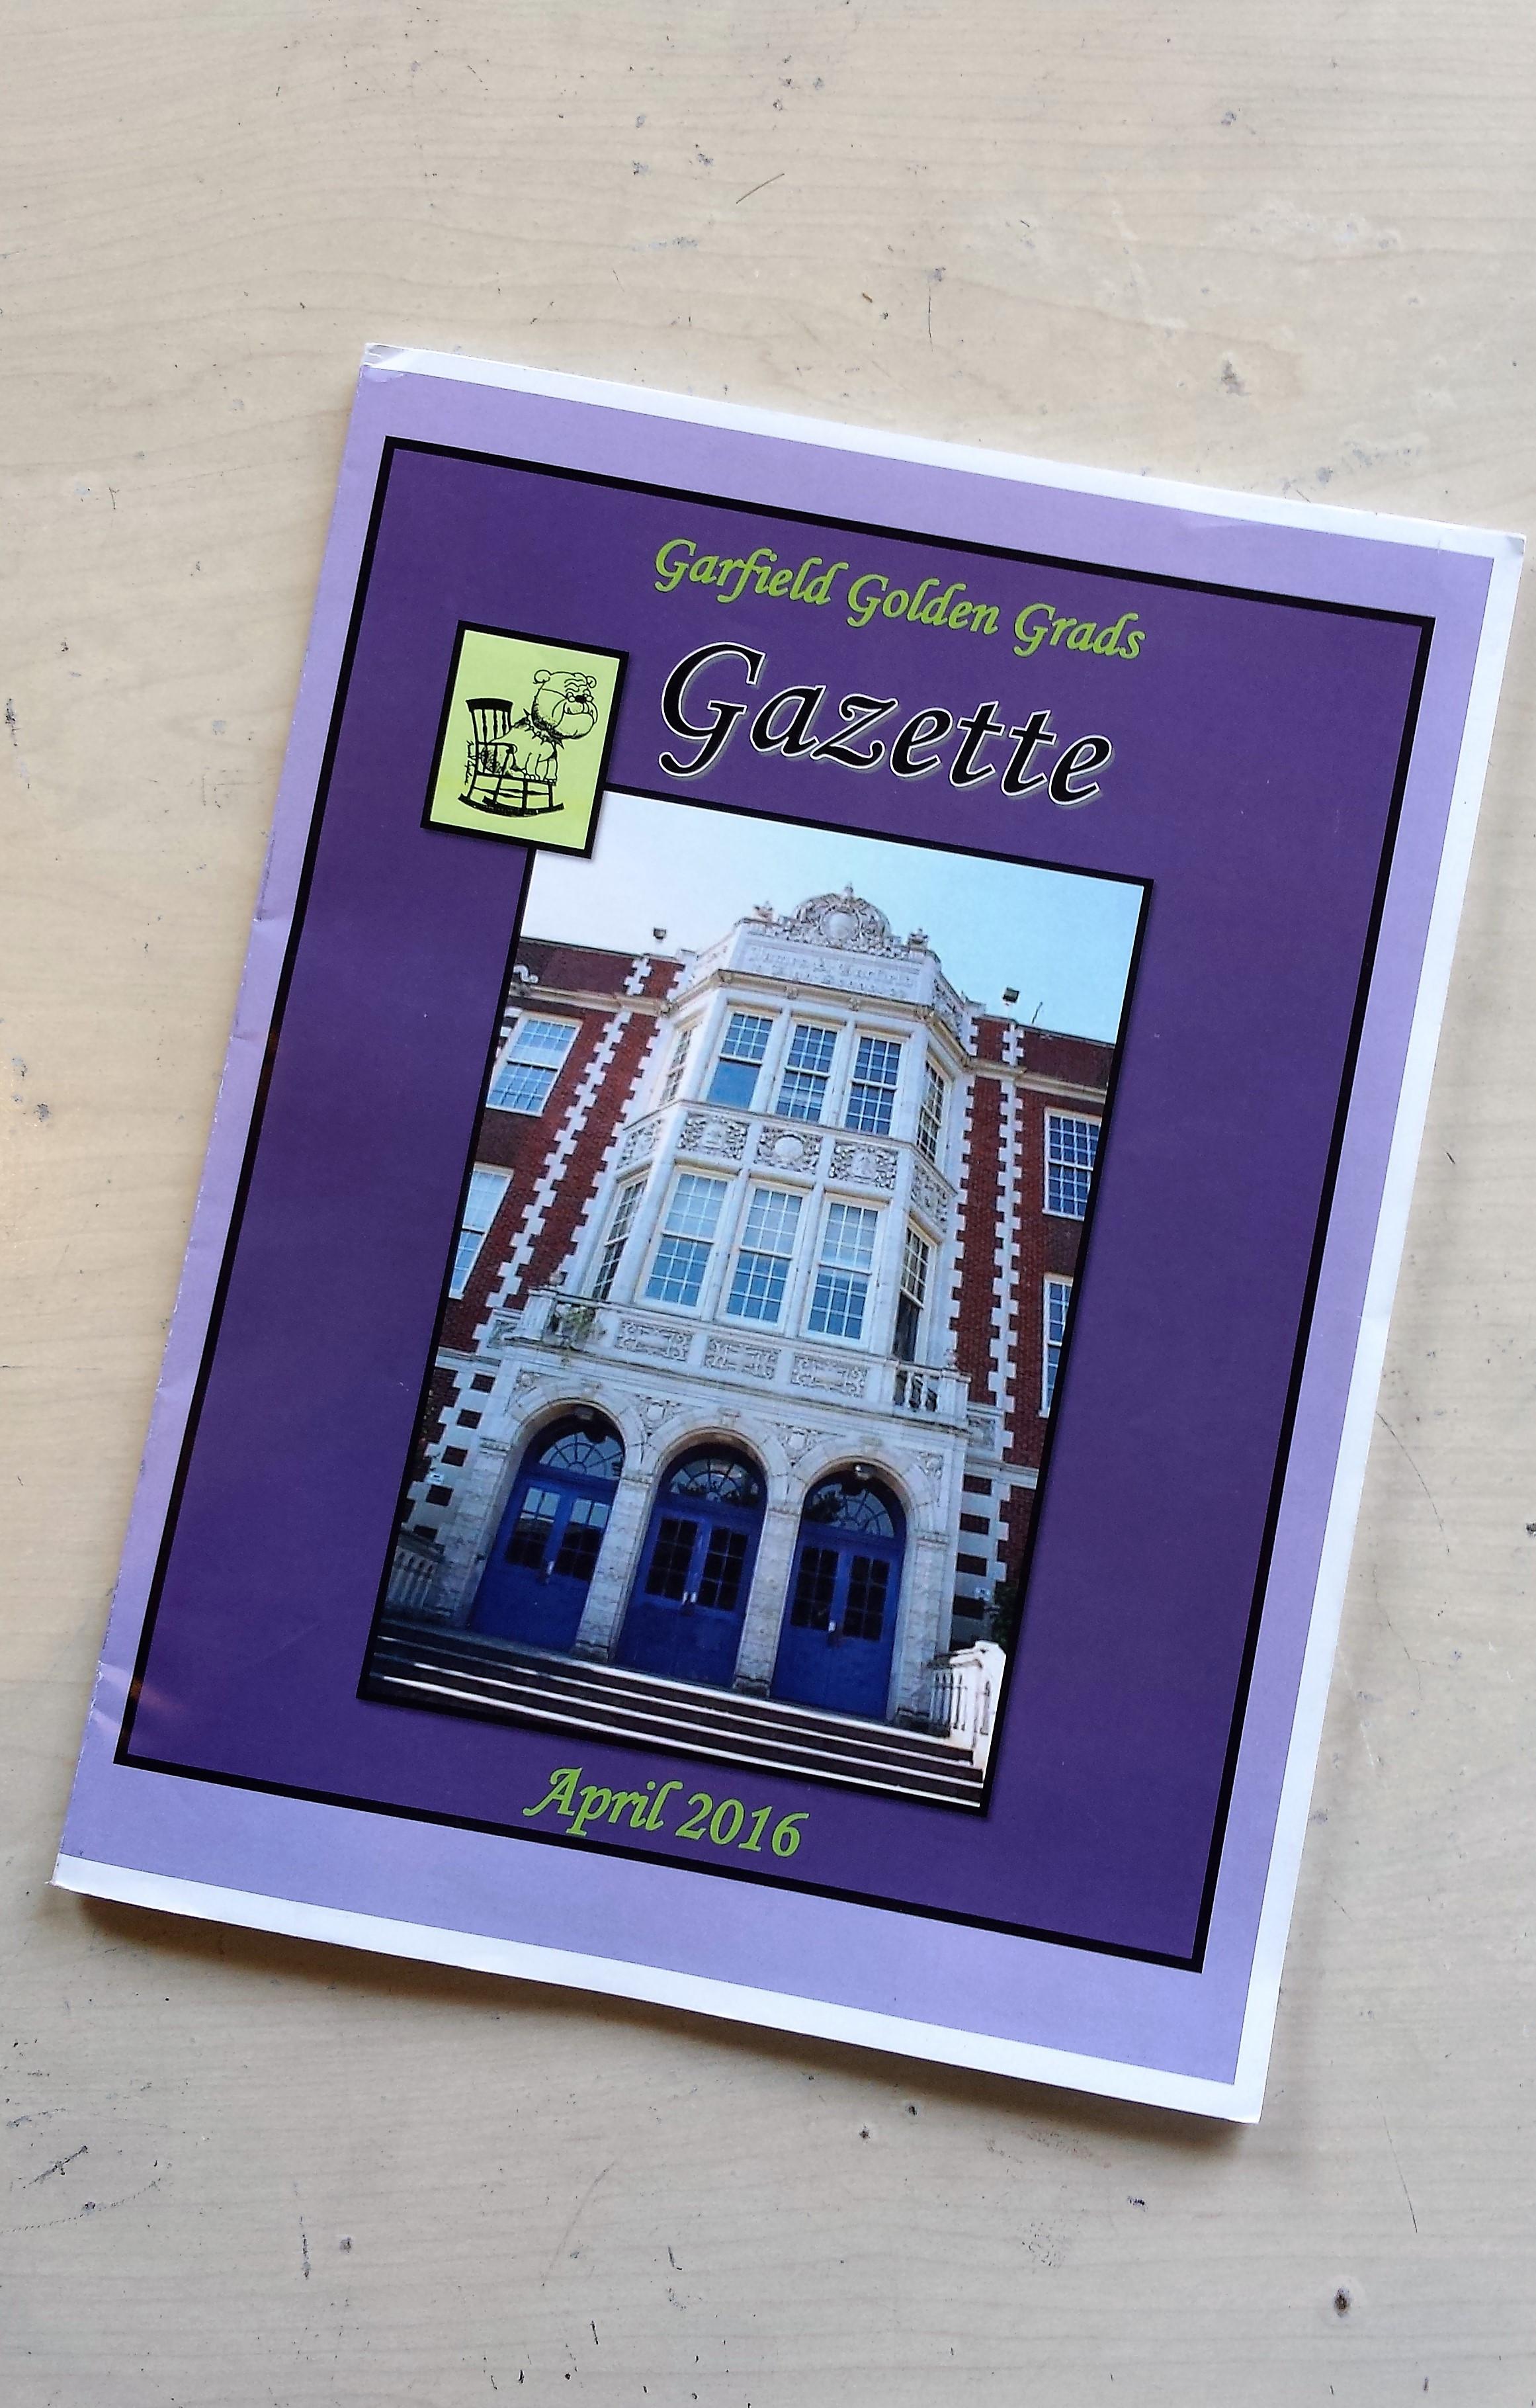 Garfield Golden Grads Gazette